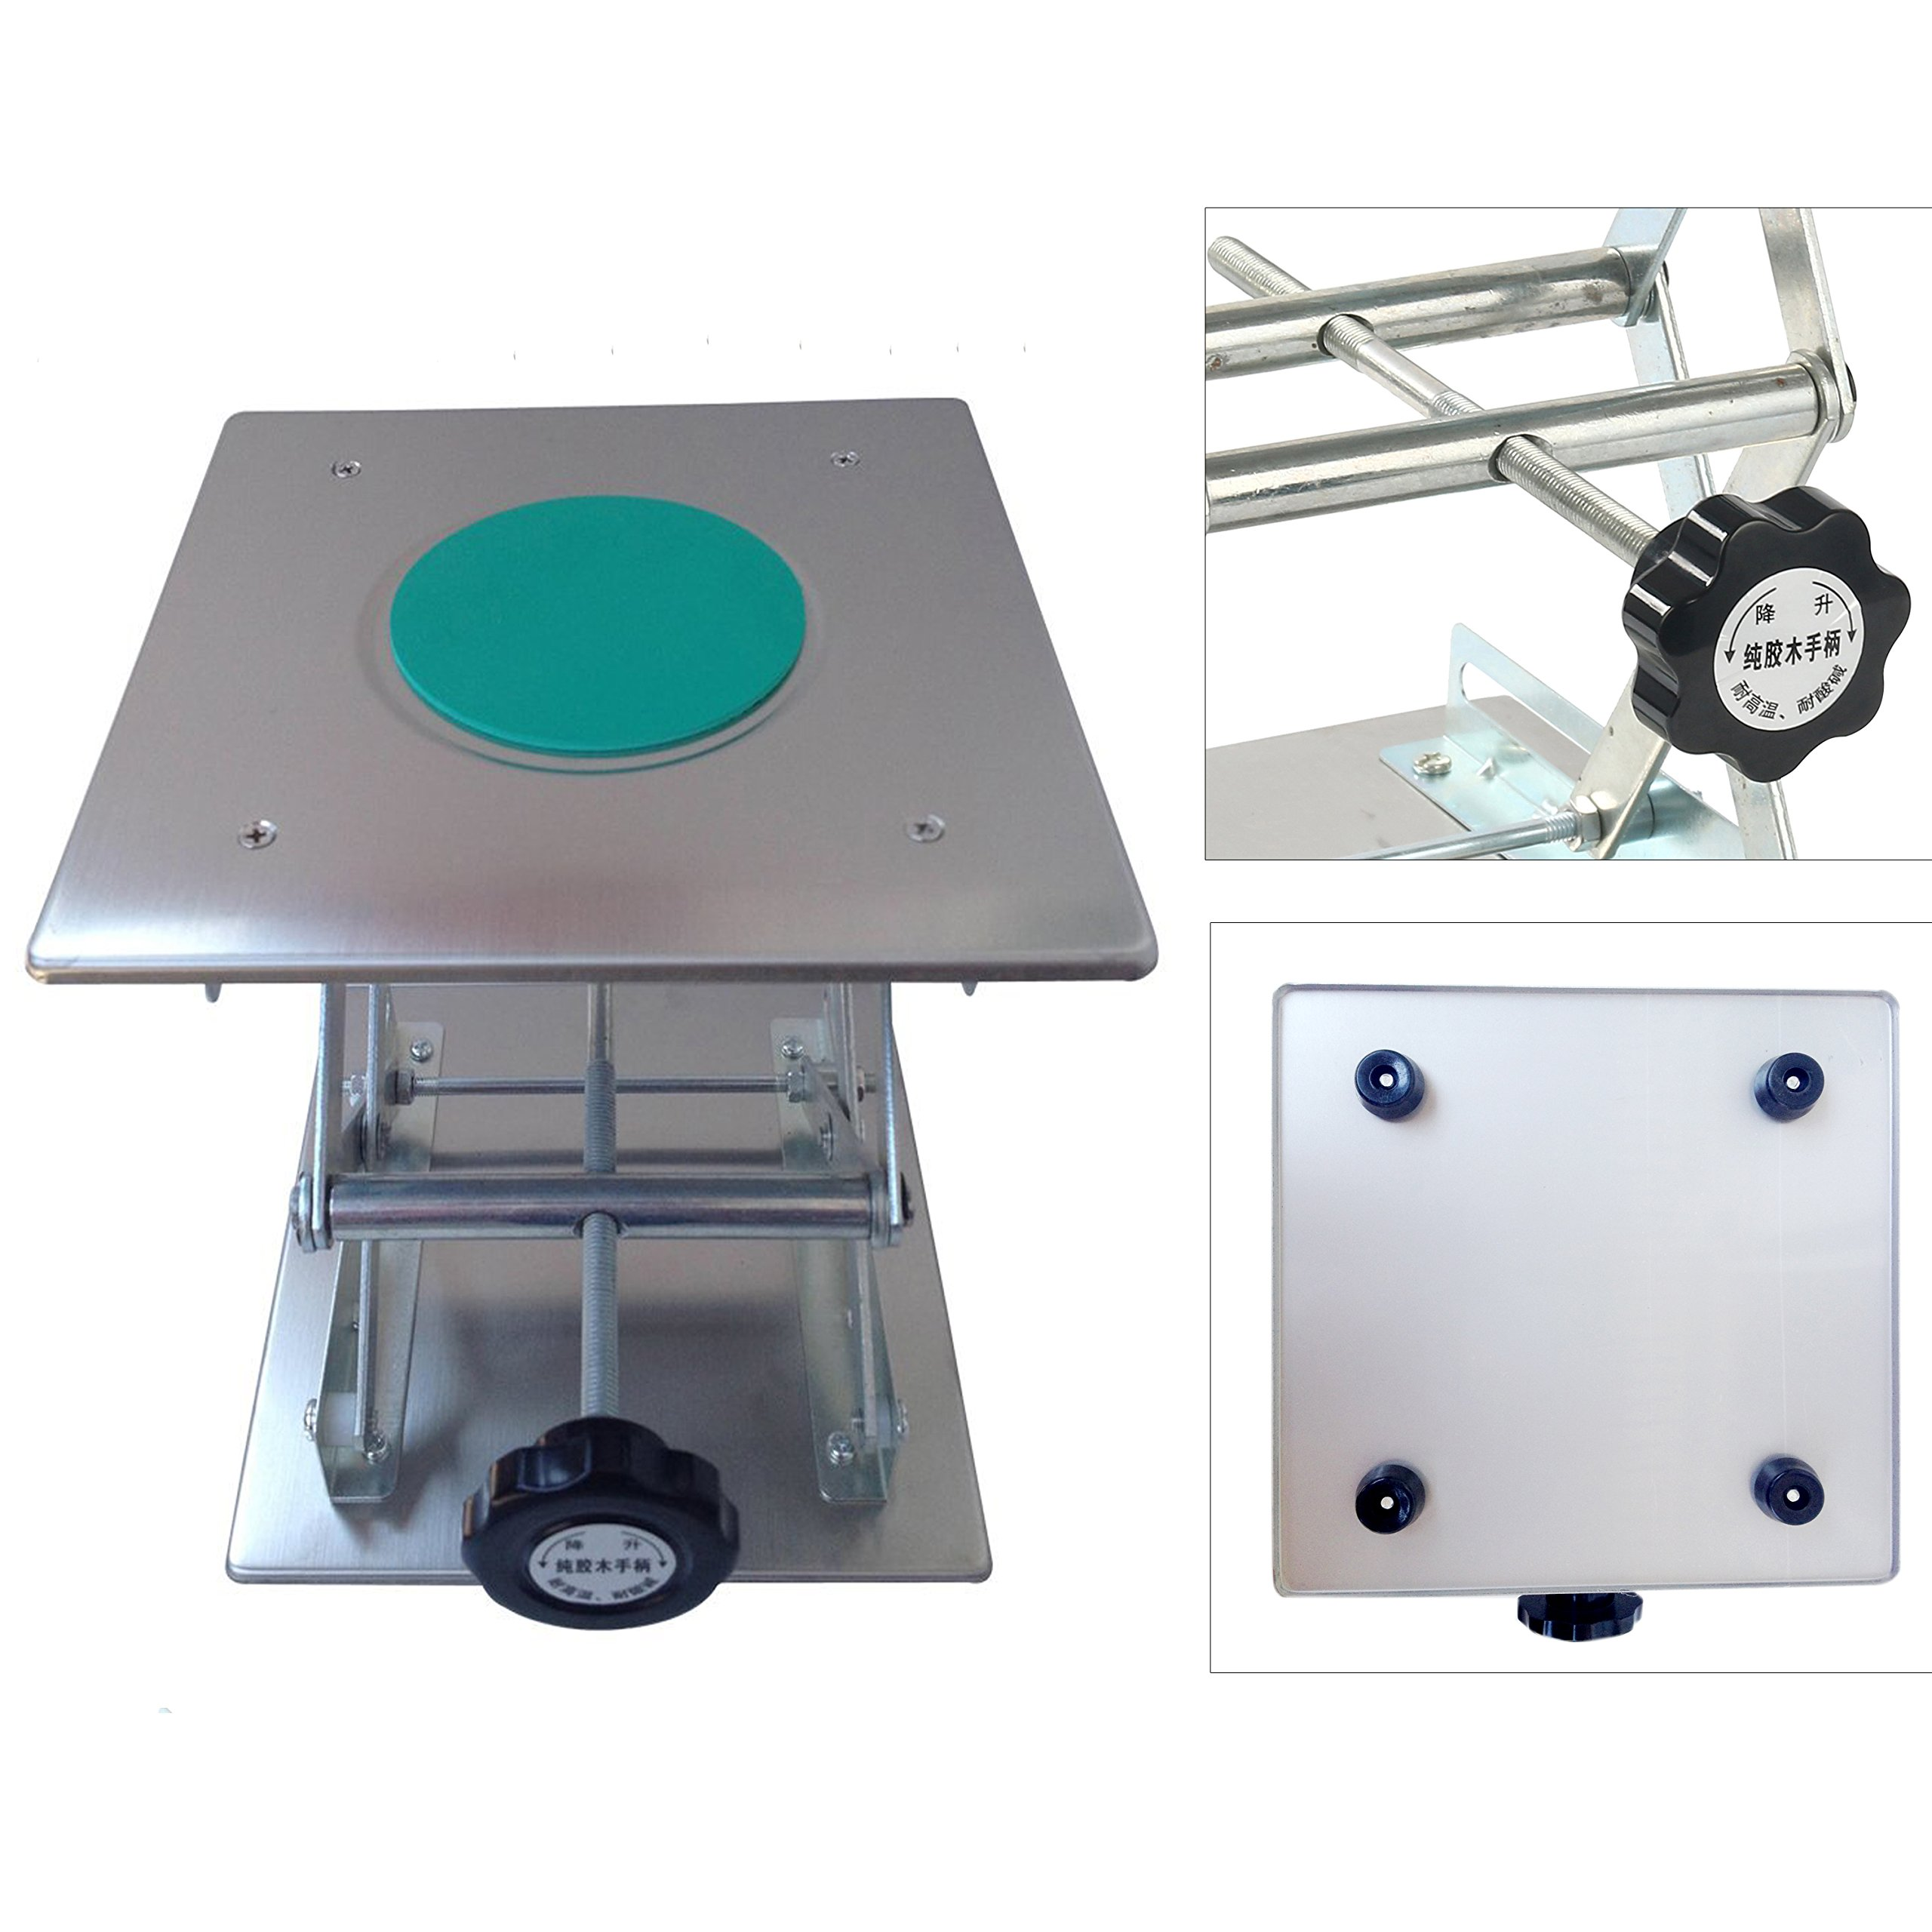 Yaetek Plate 8x8''; Overall Height 10''; Lab Jack Scissor Stand Platform LAB